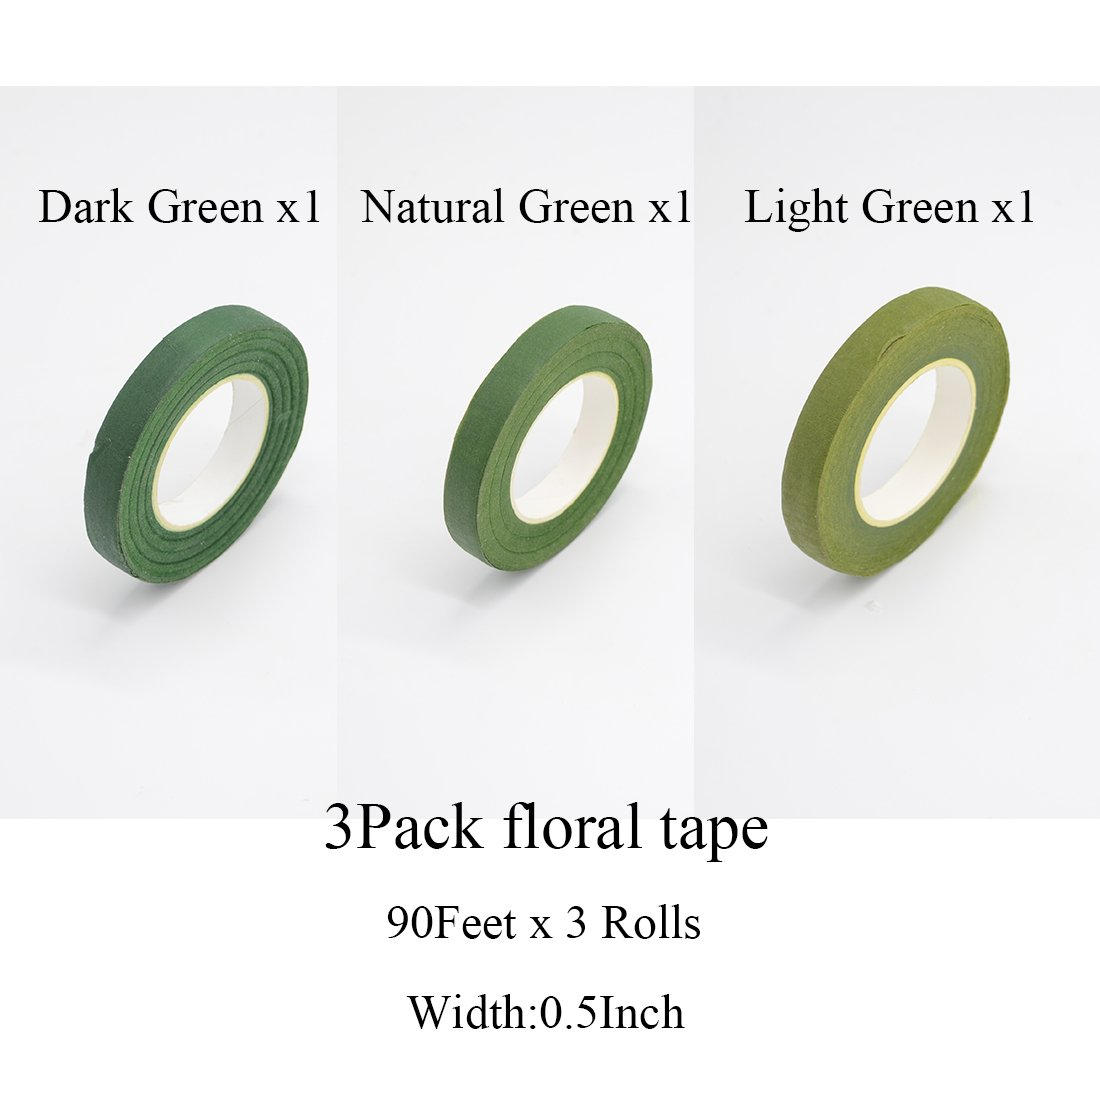 Amazon.com: FIVEWARE Floral Arrangement Tools Kit Supplies 3 Rolls ...